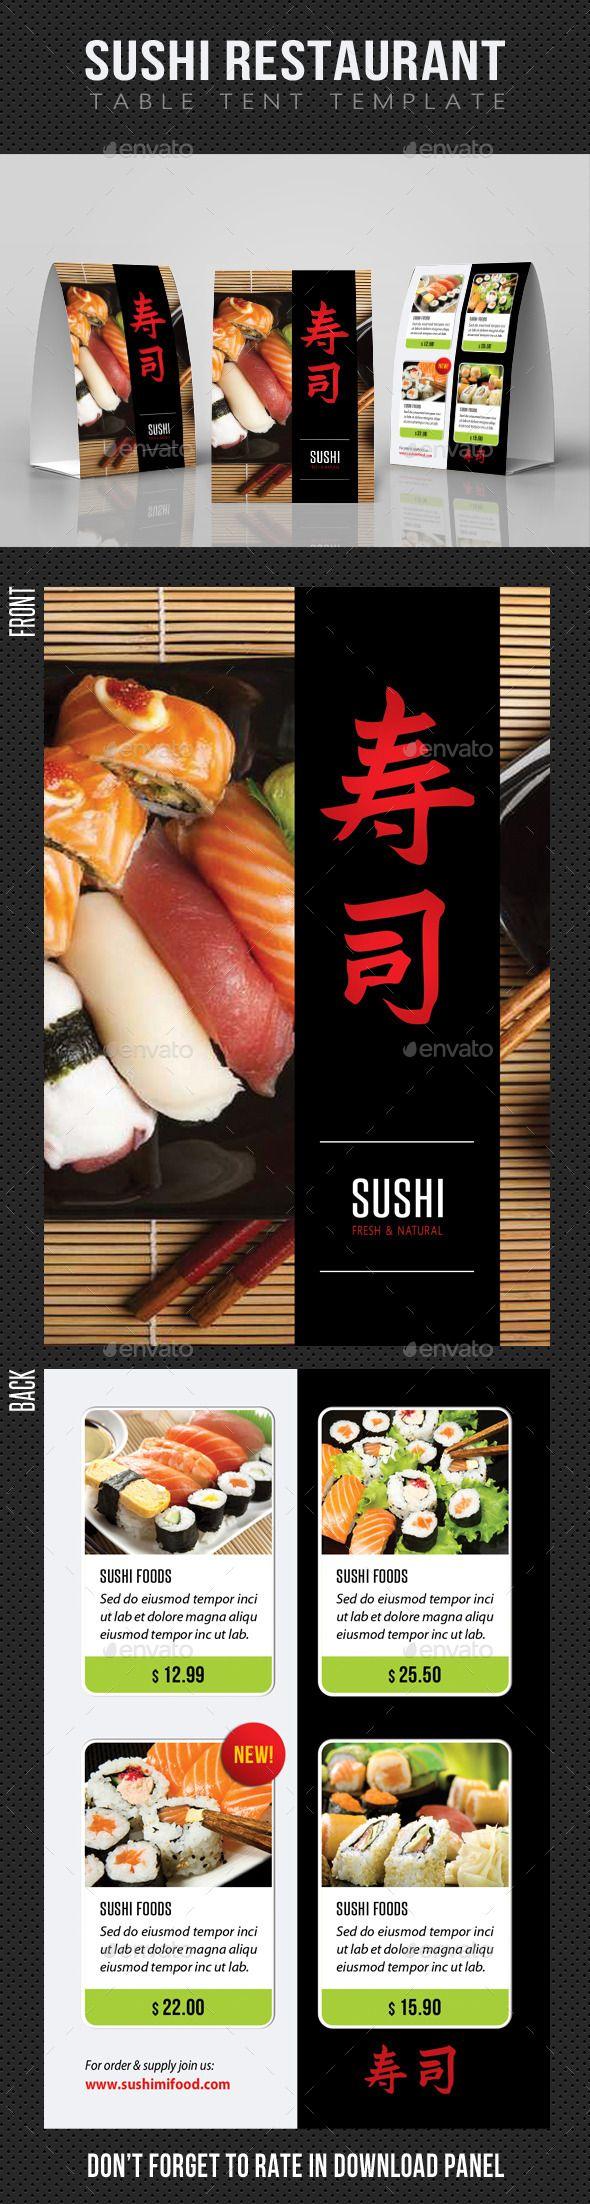 61 best sushi flyer sushi restaurant menu print templates sushi restaurant table tent template pronofoot35fo Gallery